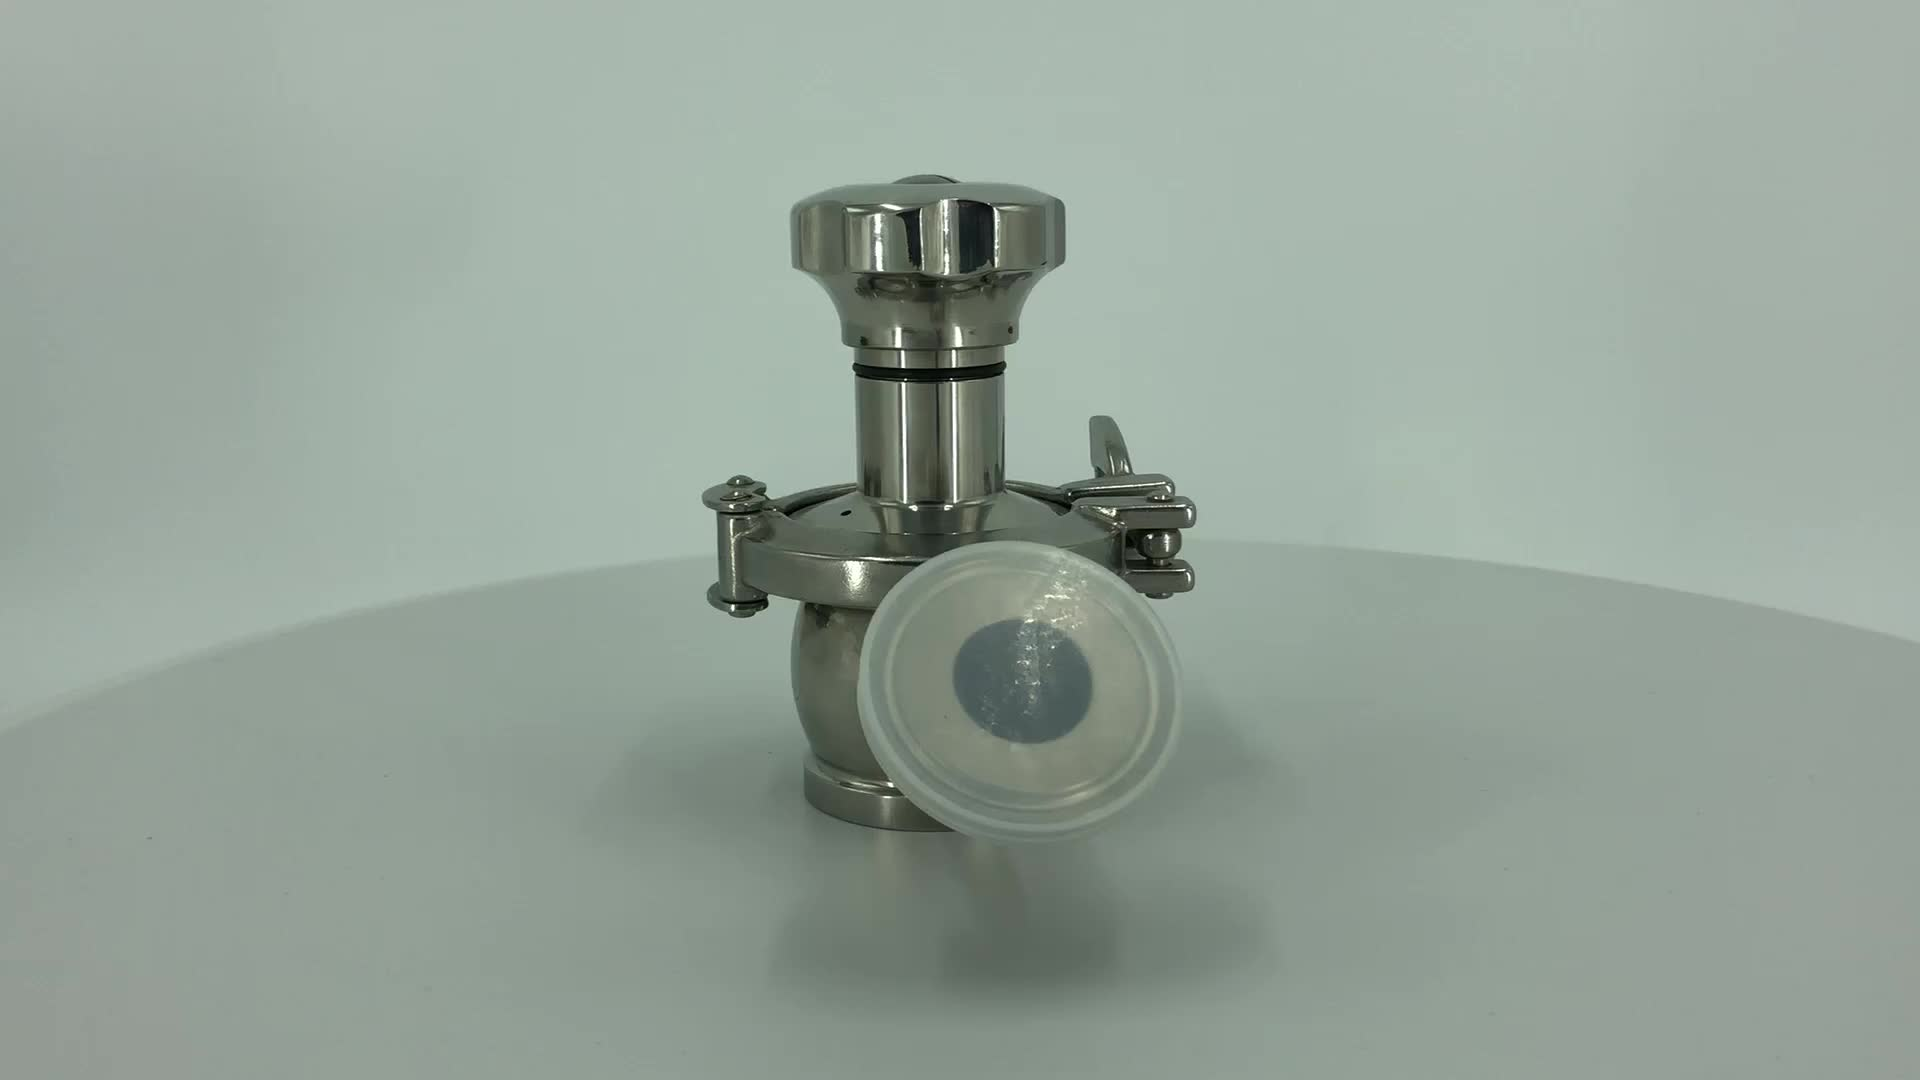 DONJOY Food Grade tank bottom diaphragm valve stainless steel 316L EPDM manual diaphragm control valve